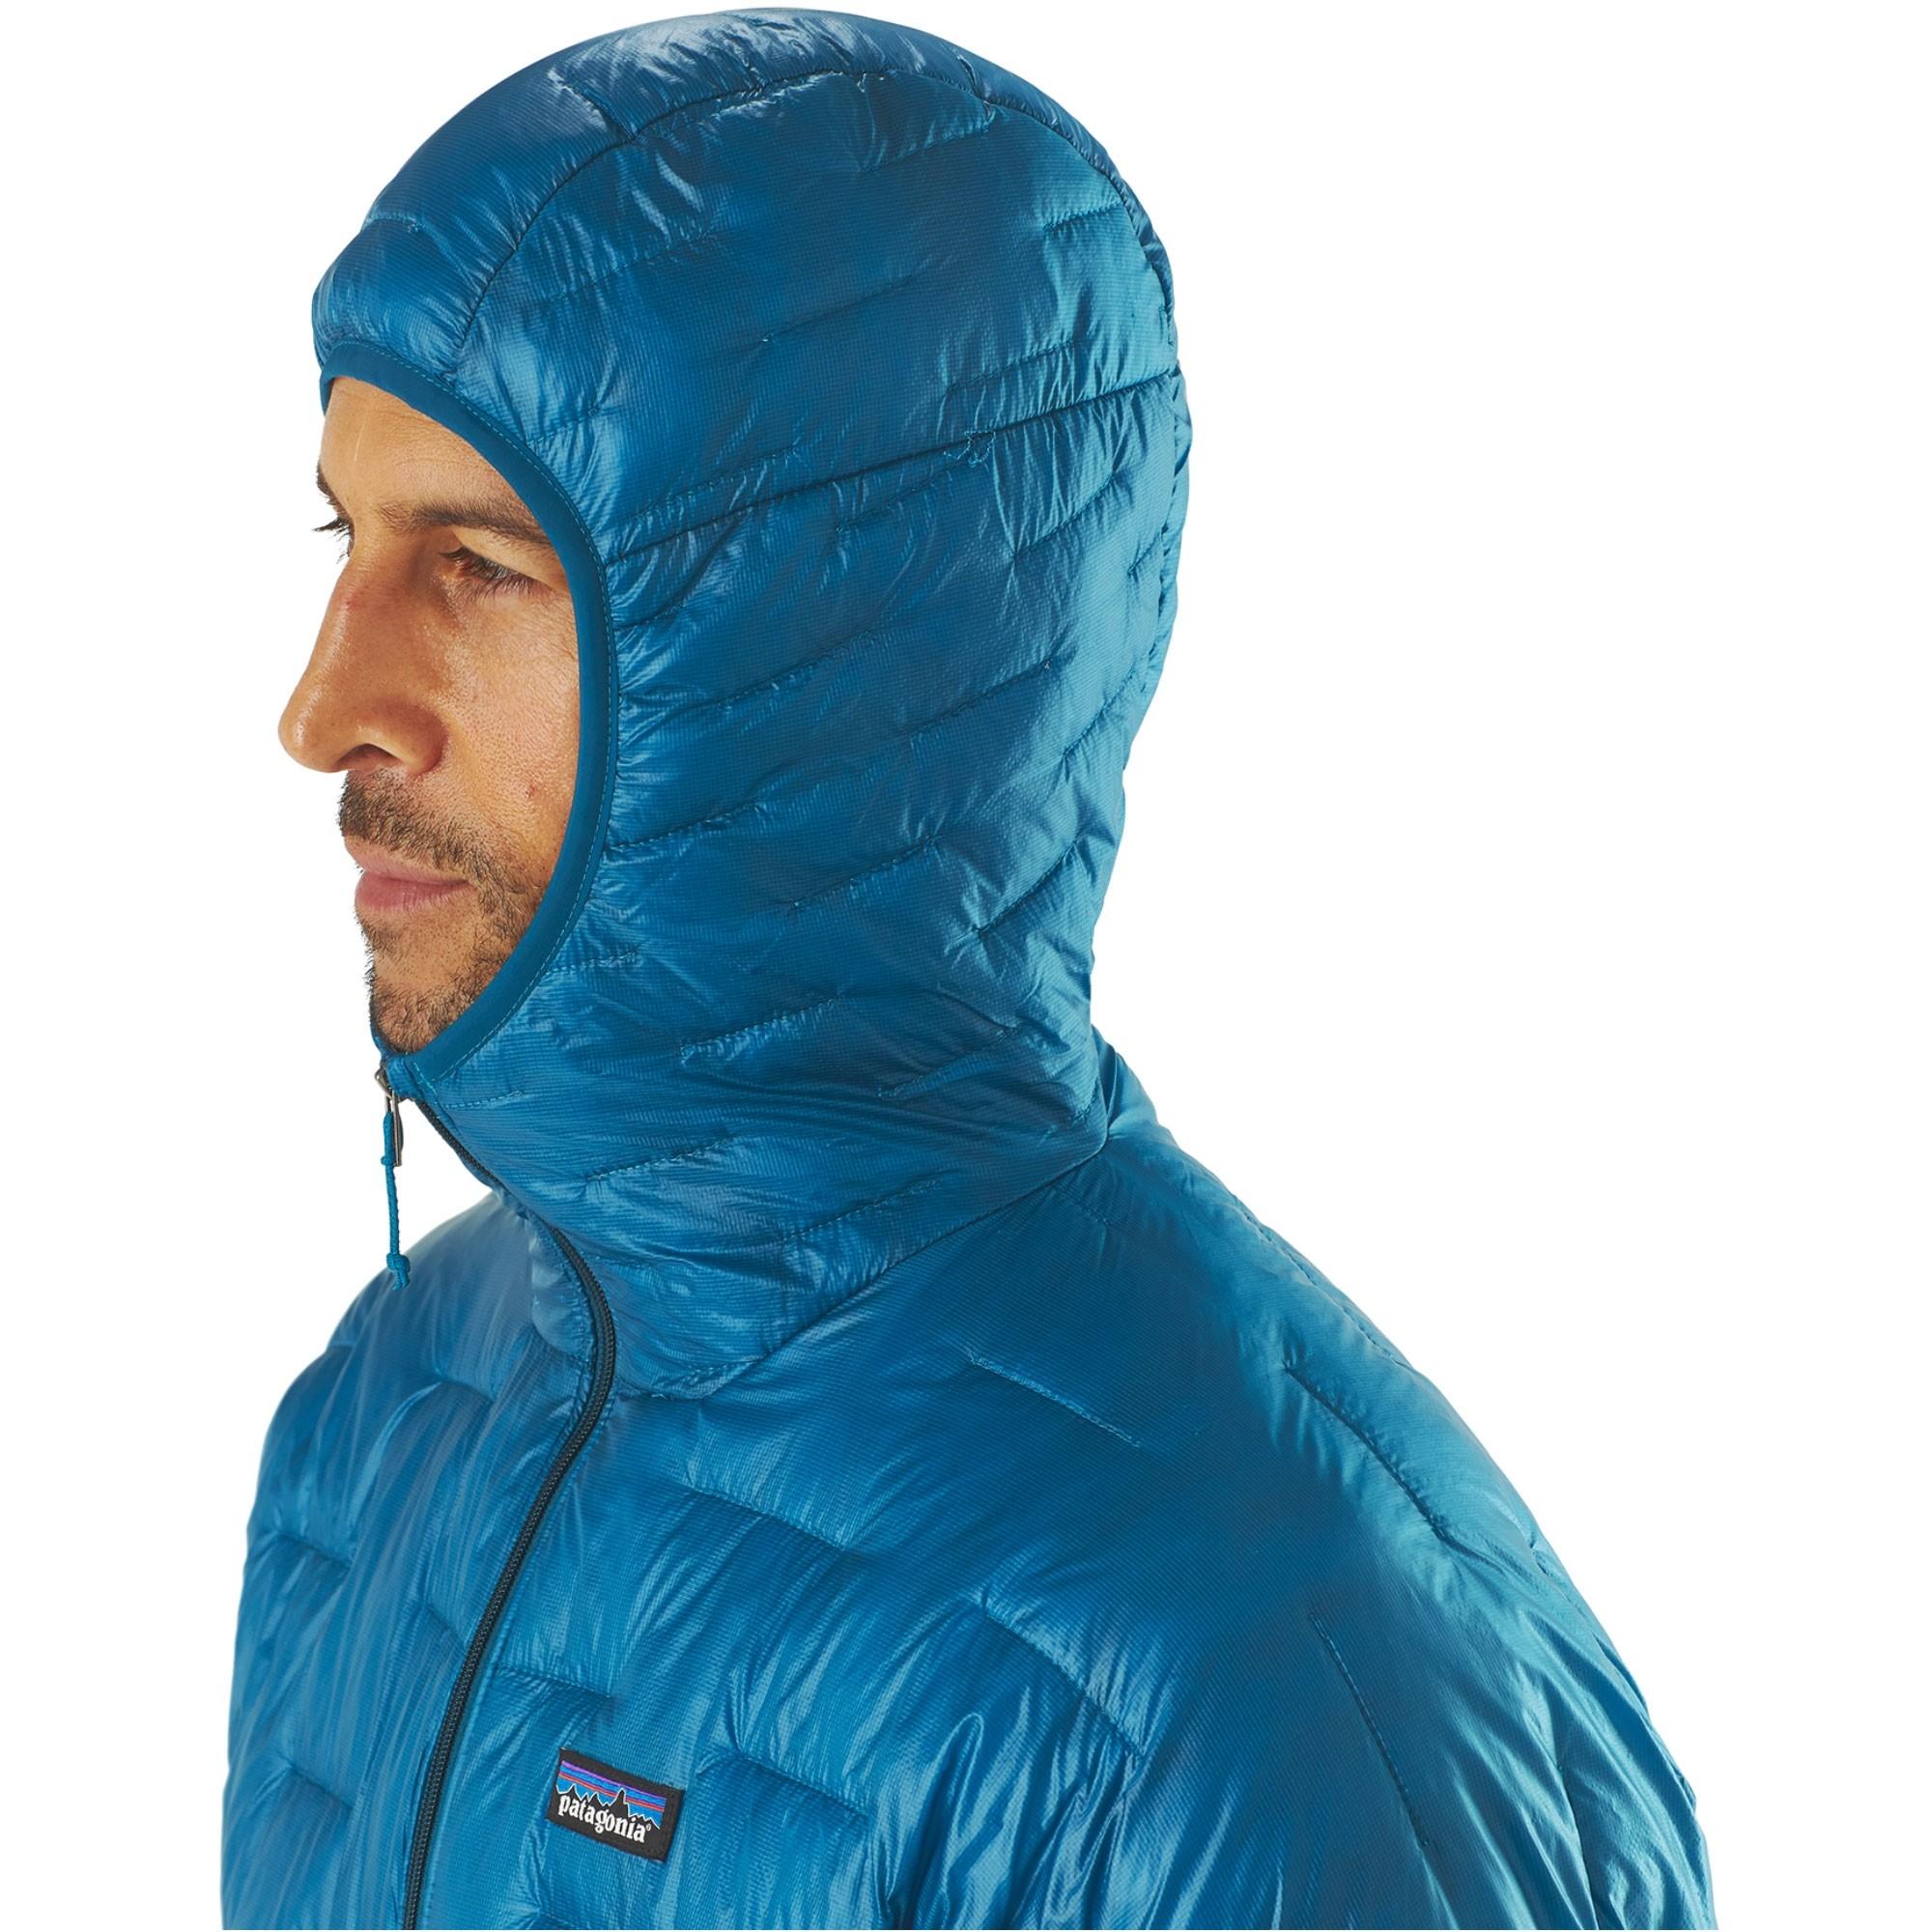 Patagonia Micro-Puff Hoody - Balkan Blue - hood